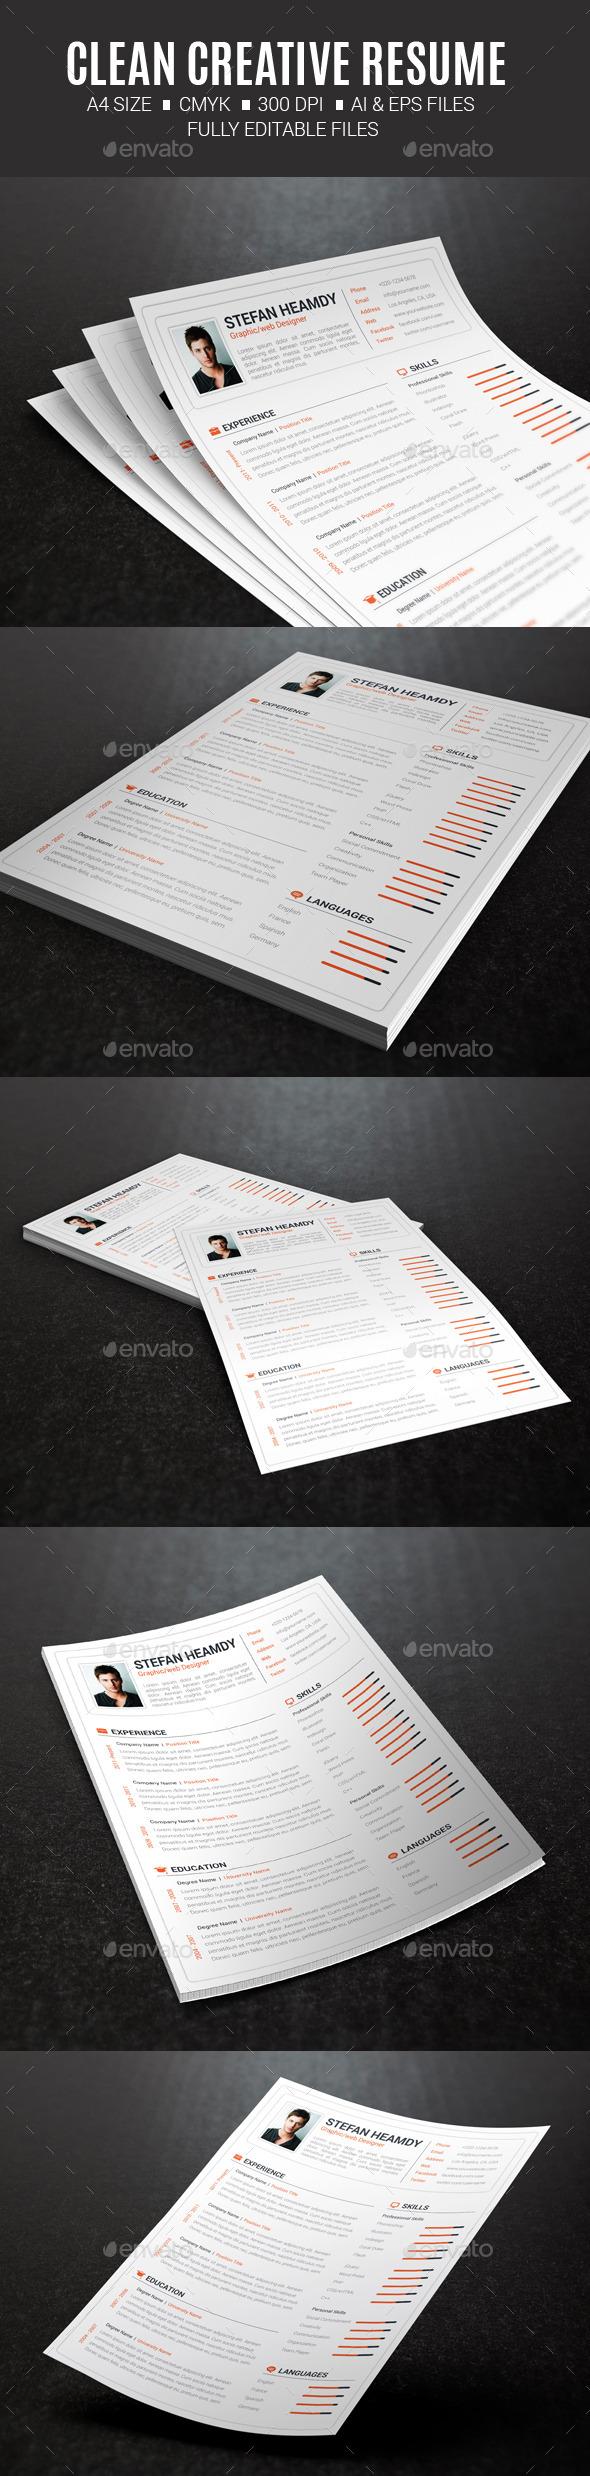 GraphicRiver Clean Creative Resume 10431728